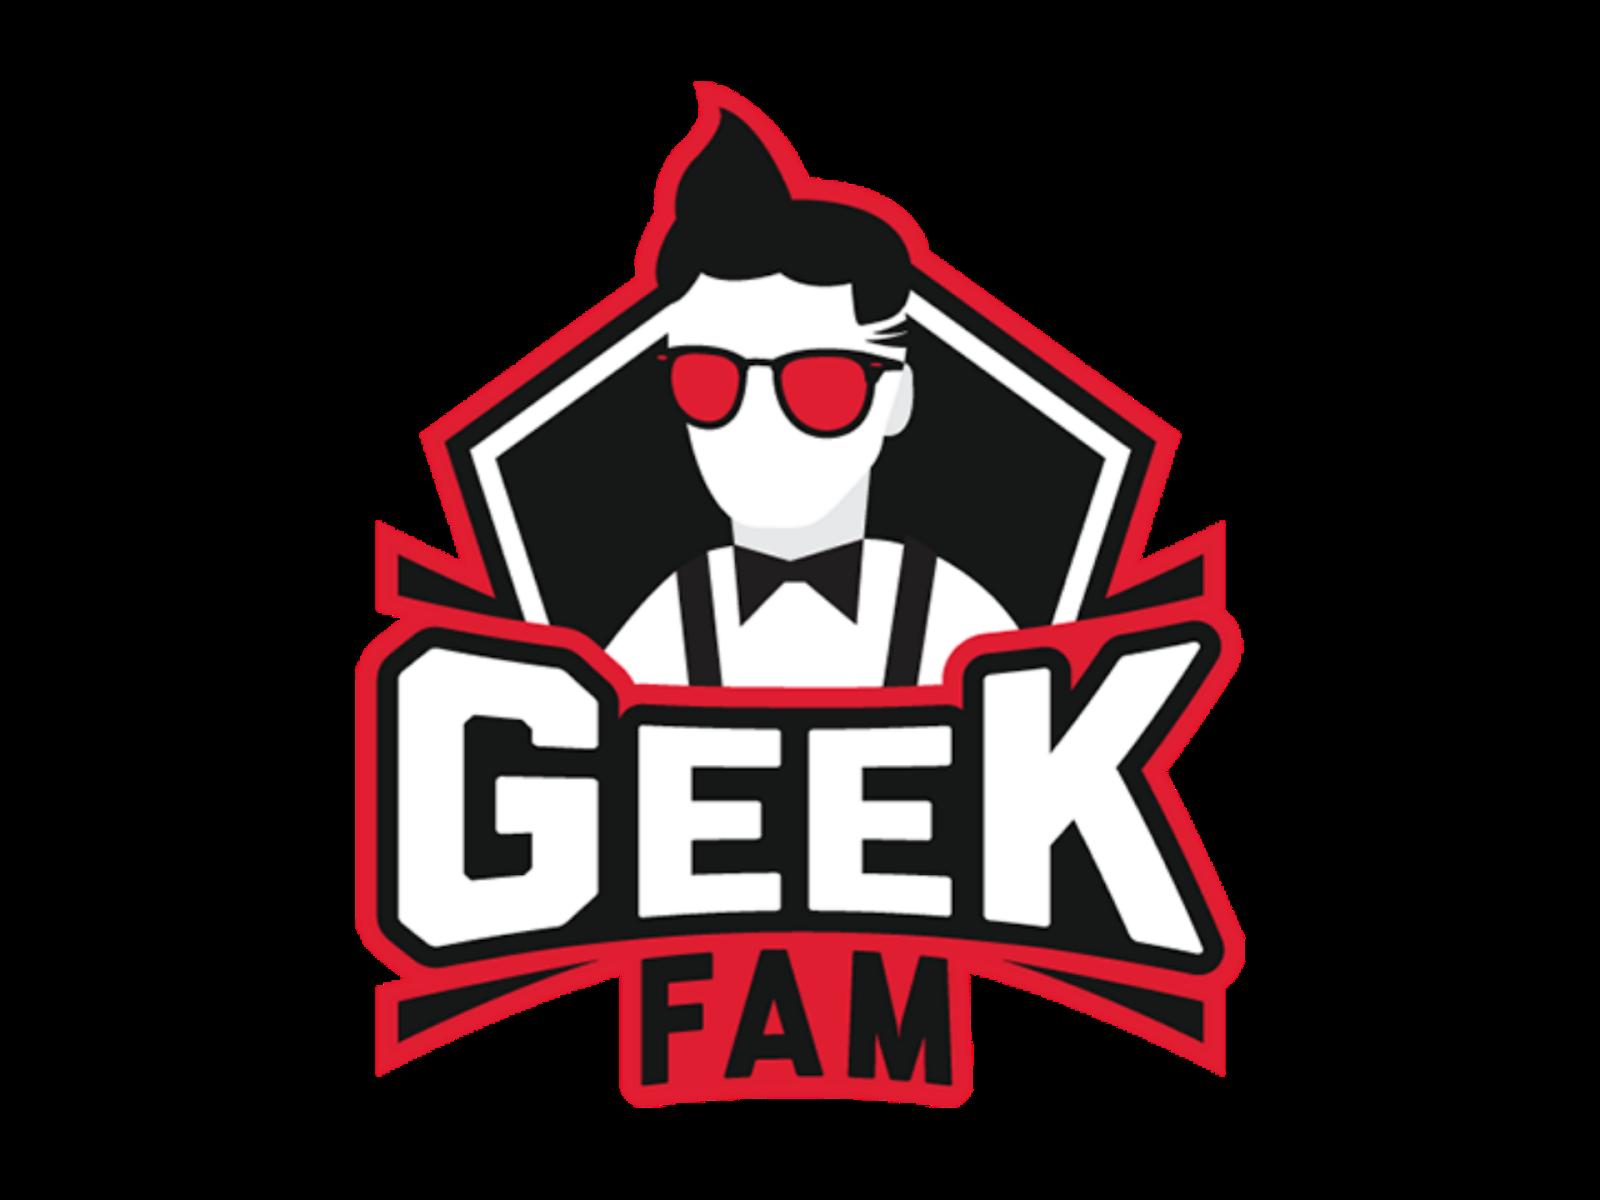 Logo Geek Fam Format PNG